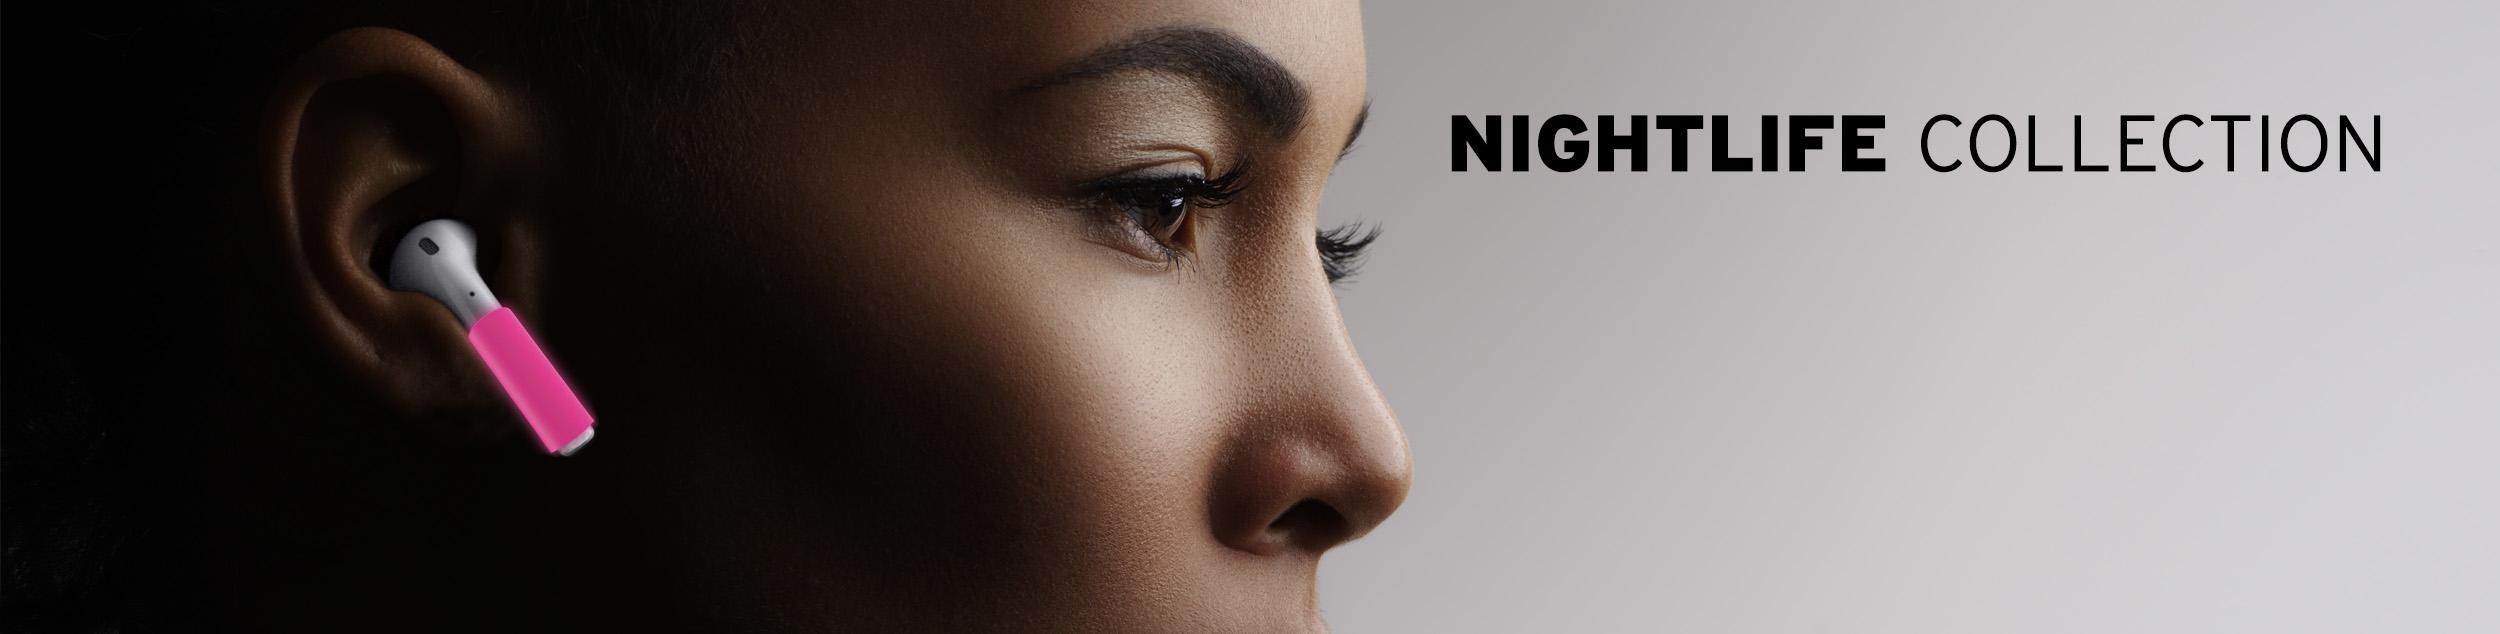 Nightlife02